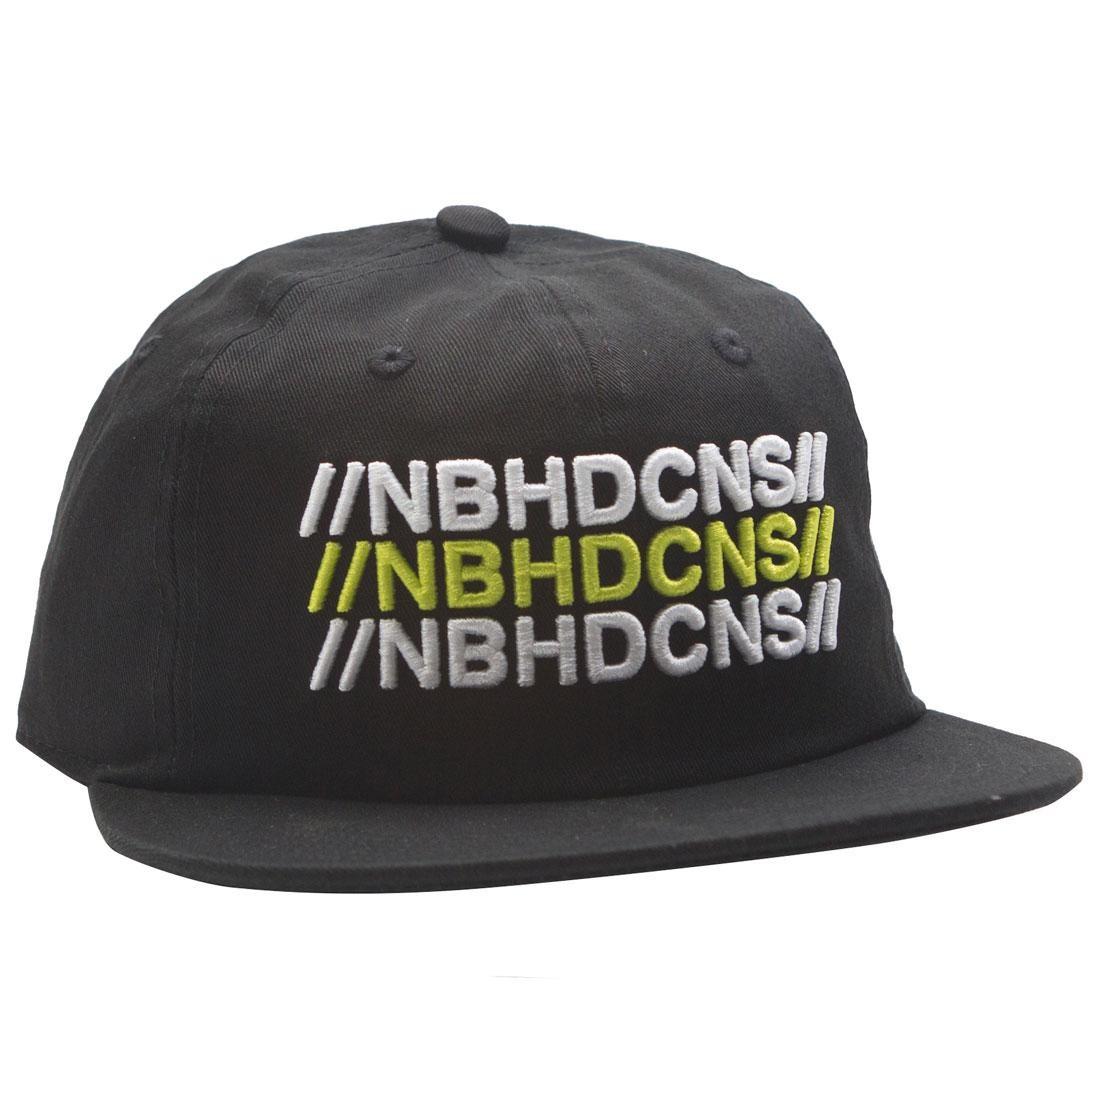 Converse x Neighborhood 6 Panel Hat (black)